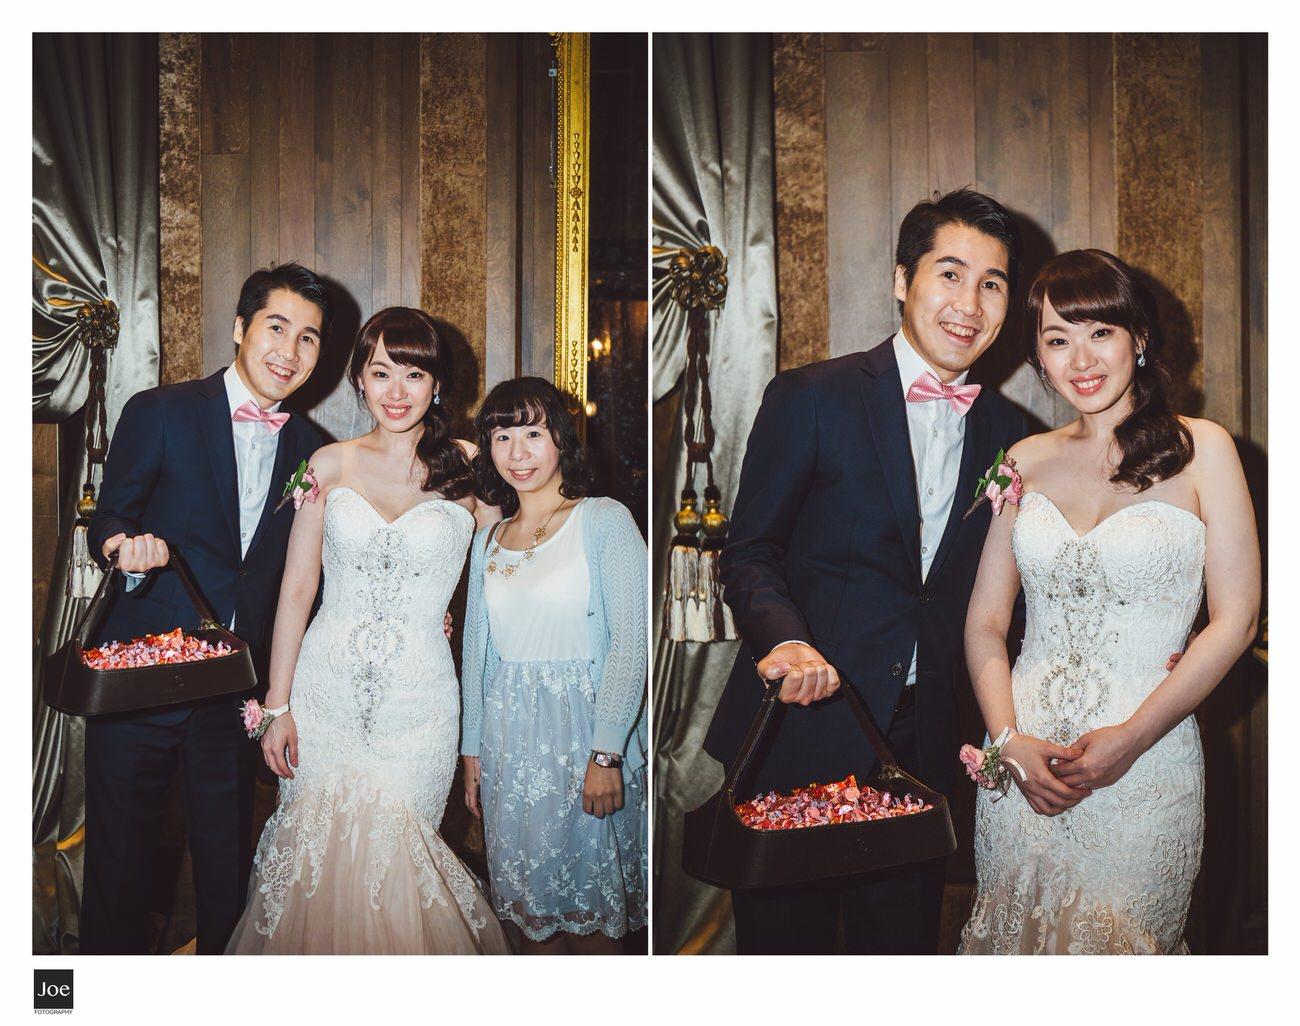 joe-fotography-wedding-photo-palais-de-chine-hotel-053.jpg